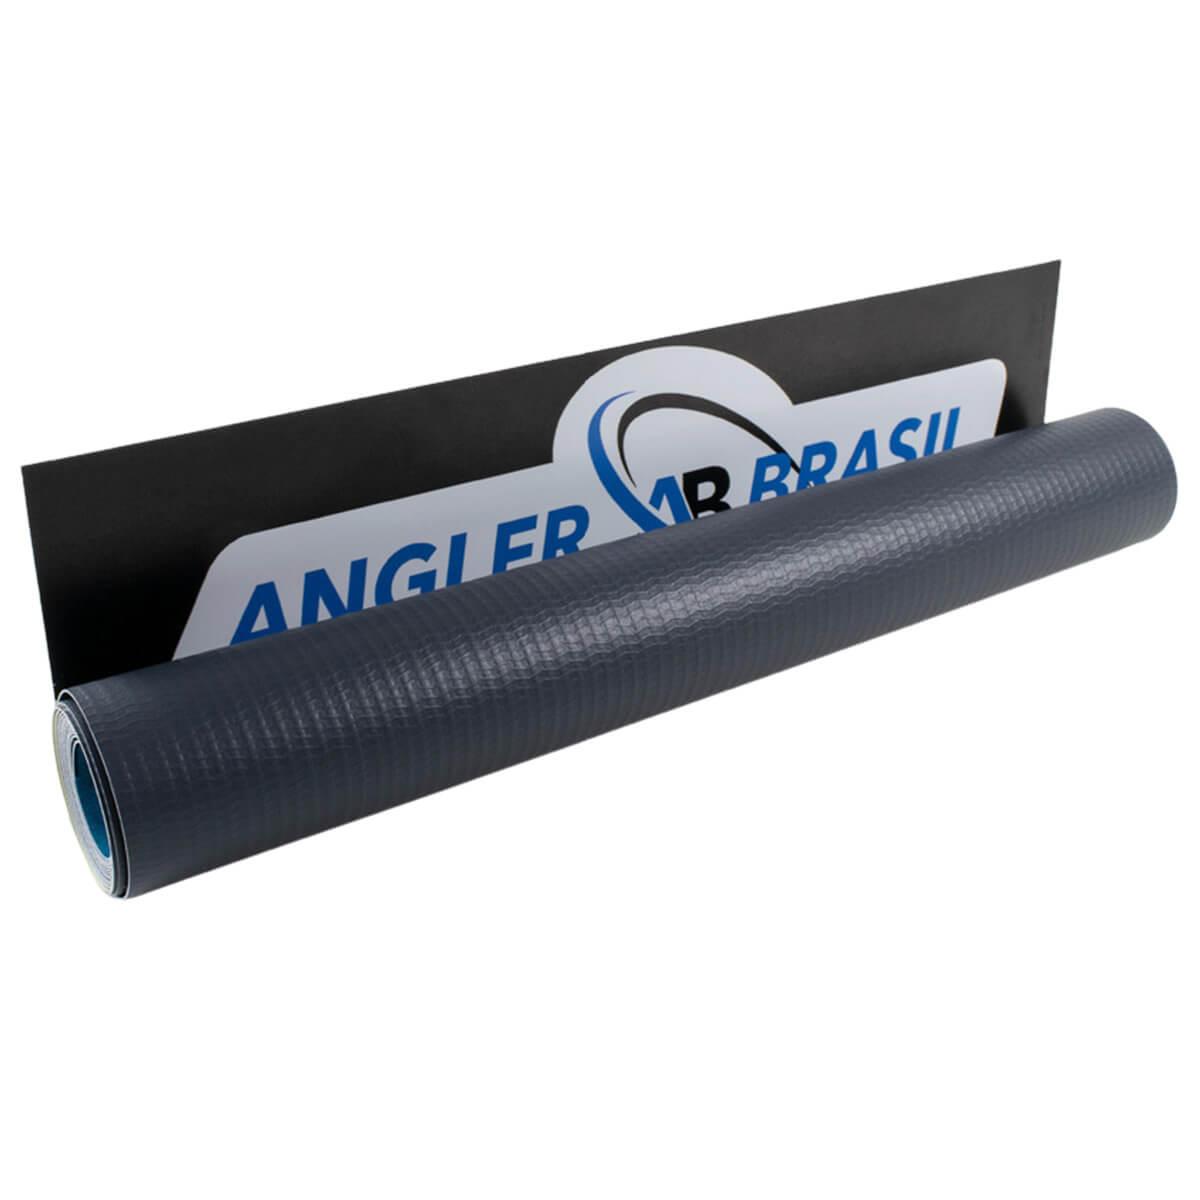 RÉGUA PARA MEDIR PEIXES ANGLER BRASIL - 1 METRO